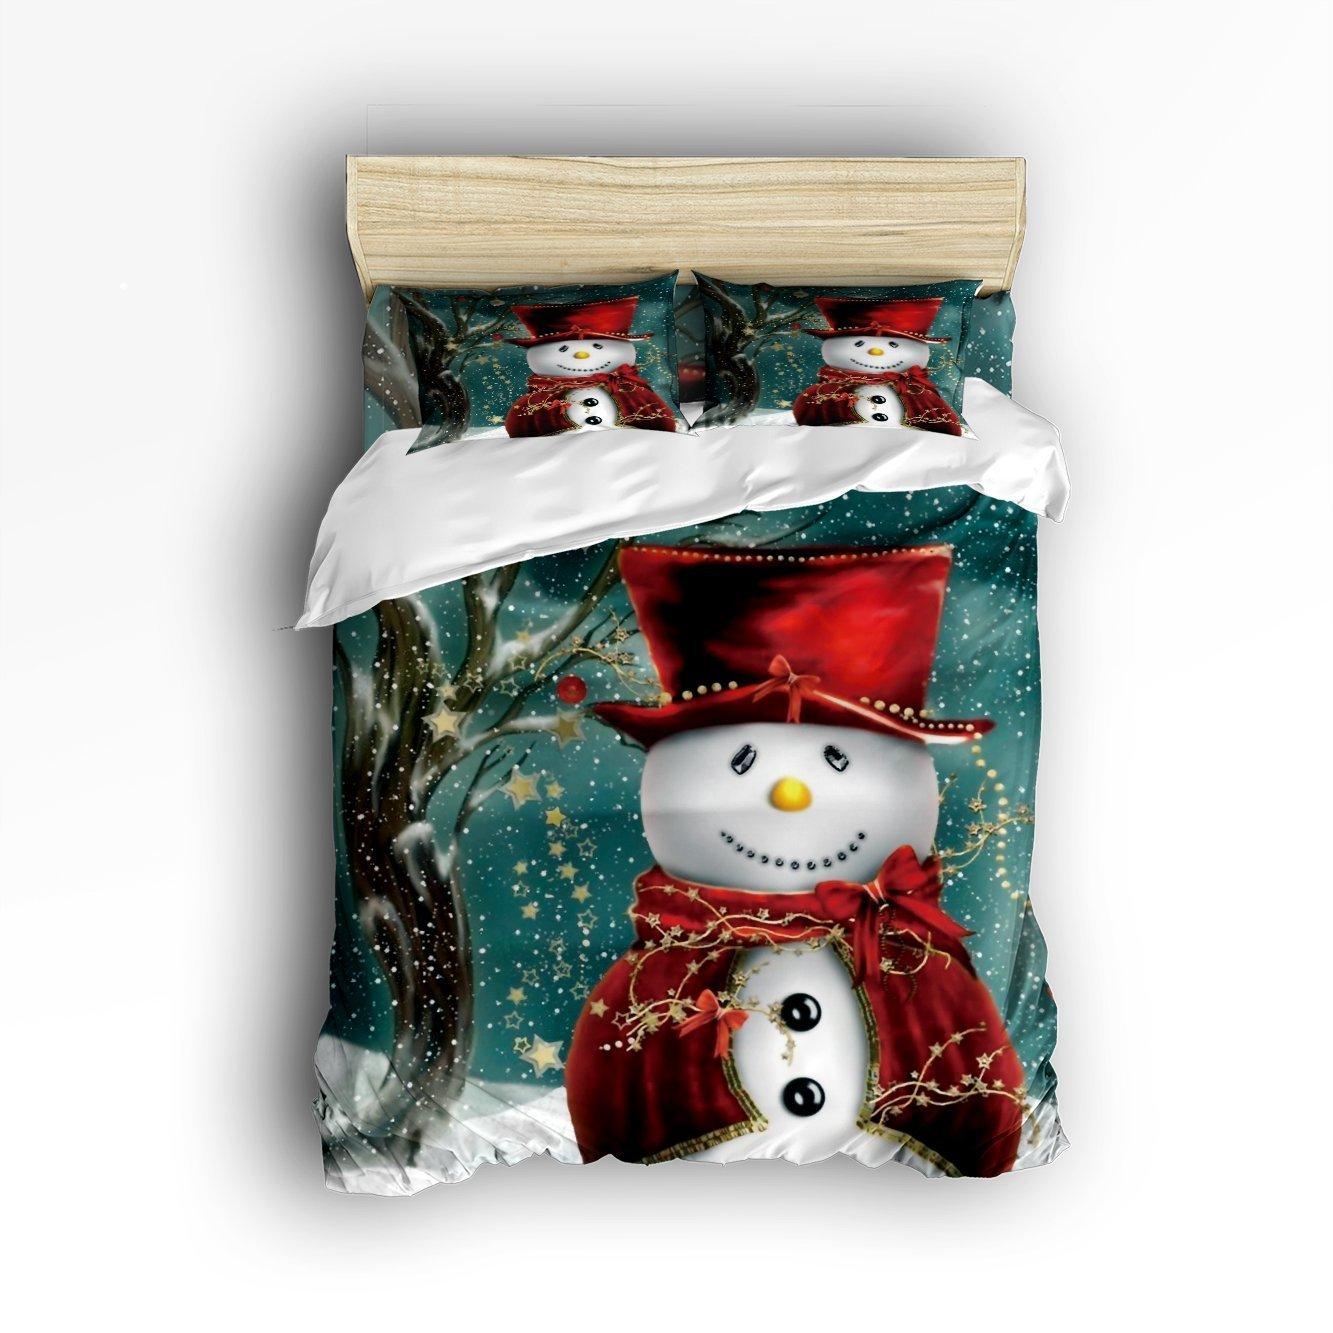 4 Pieces Snowman Winter Christmas Digital Print Home Comforter Bedding Sets Duvet Cover Sets Bedspread for Adult Kids,Flat Sheet, Shams Set Full Size